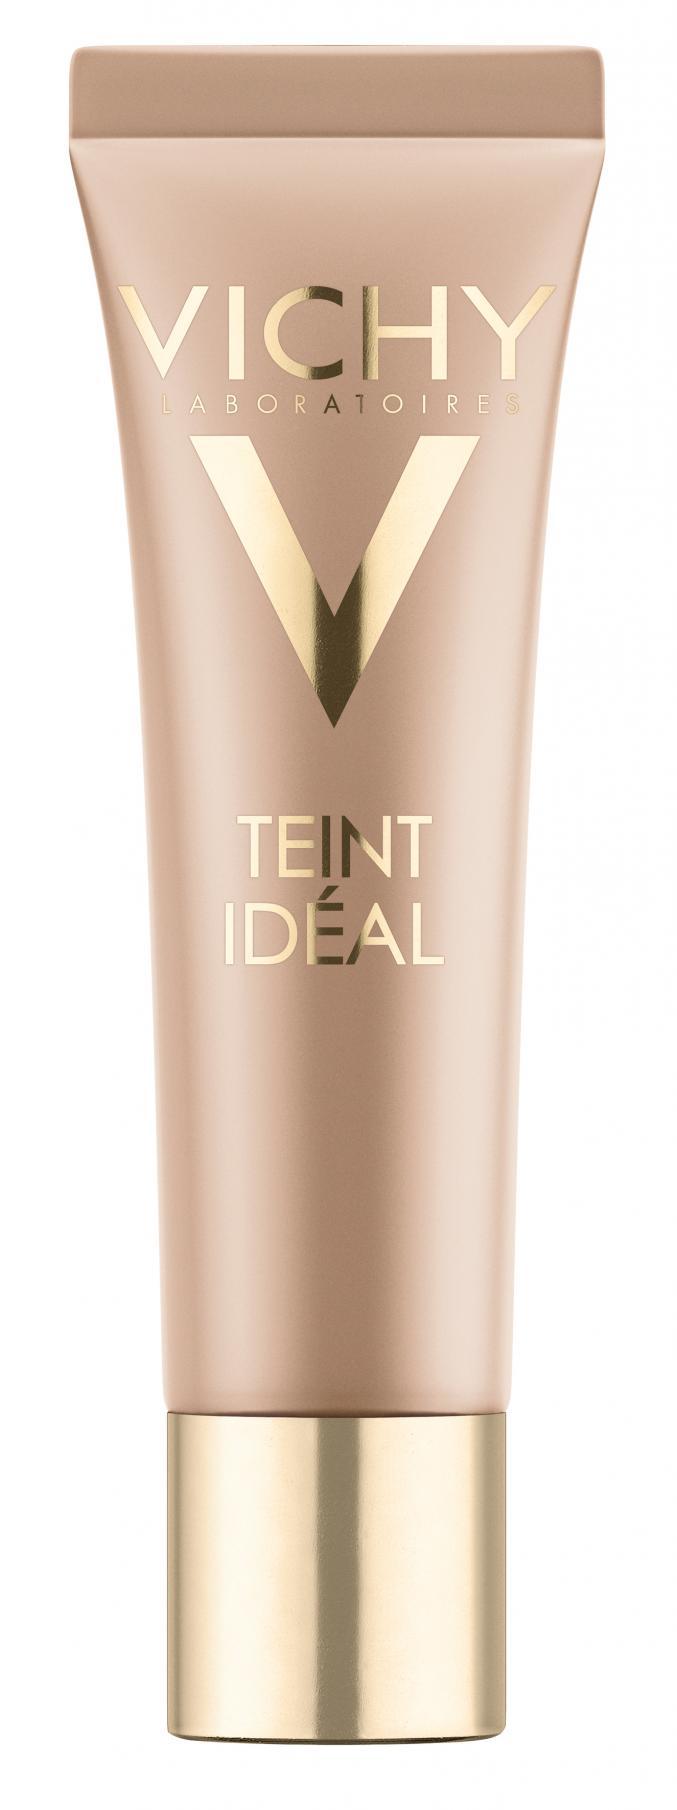 Teint Idéal Crème (Vichy)